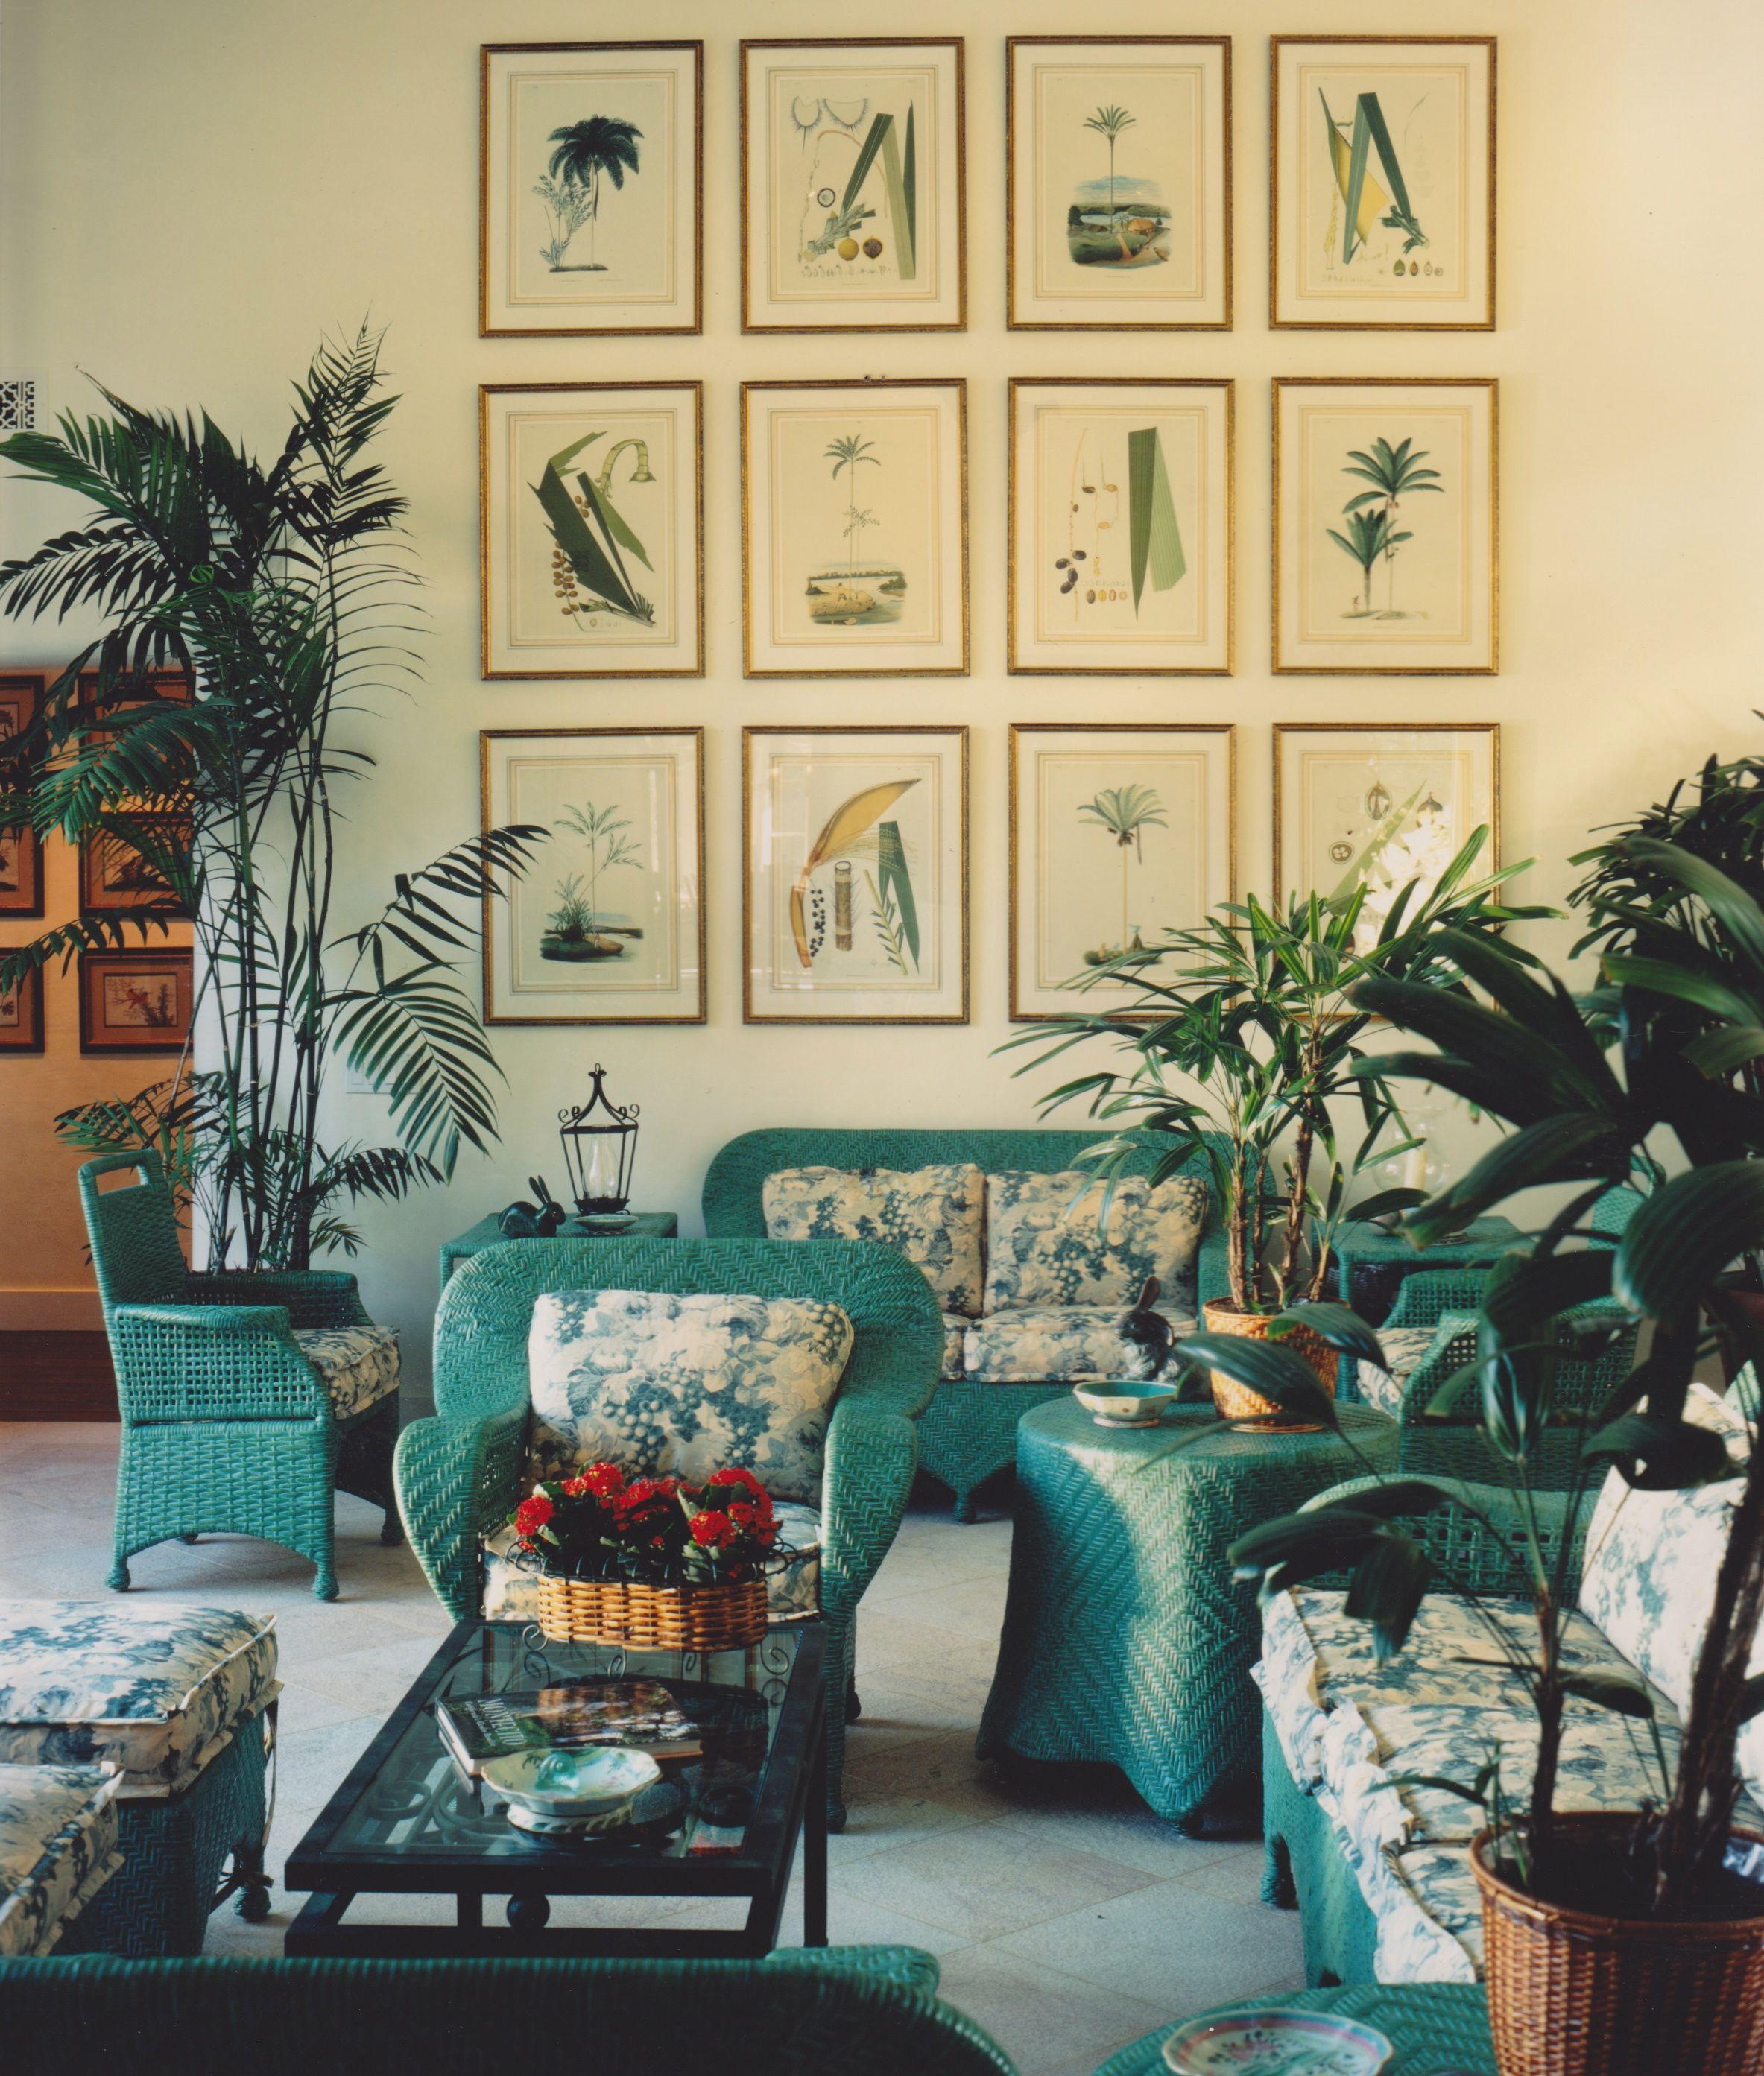 penny bianchi | Garden room | Pinterest | Art walls, Room and Walls